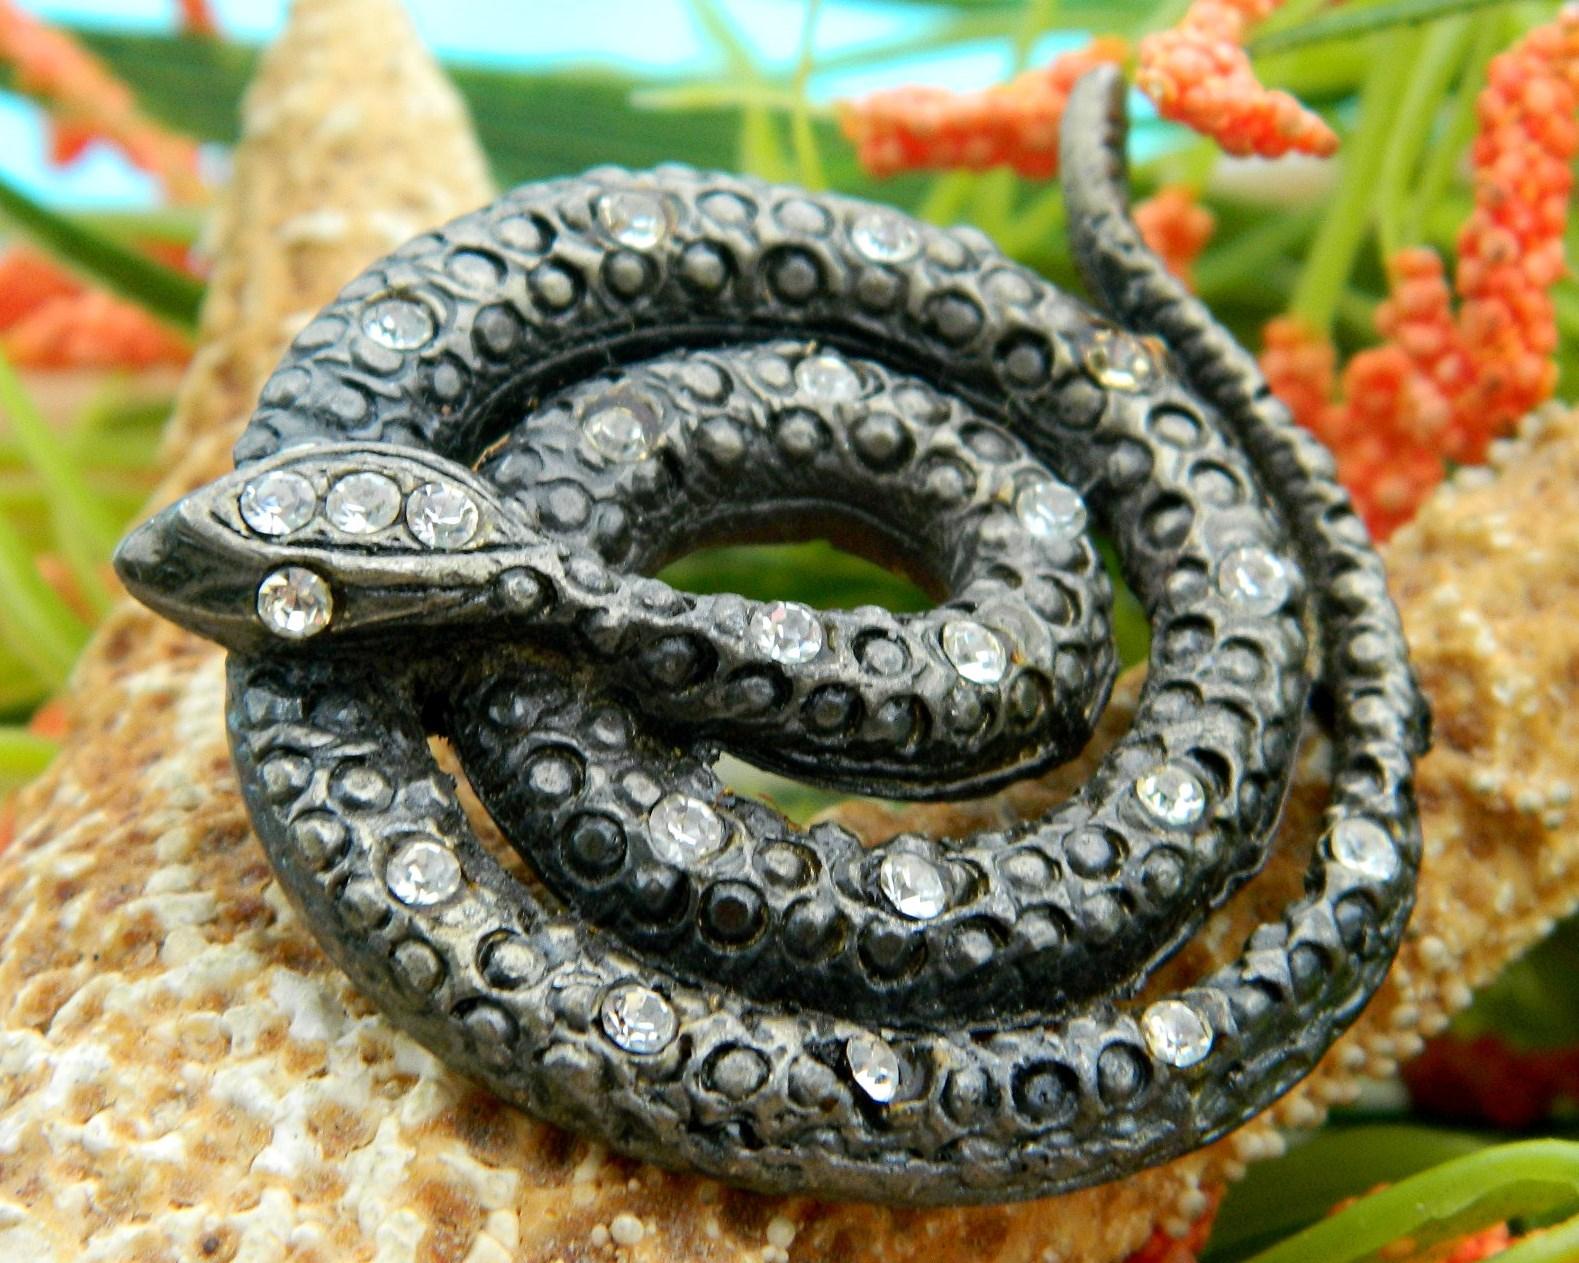 Vintage coiled snake brooch pin figural rattlesnake rhinestones